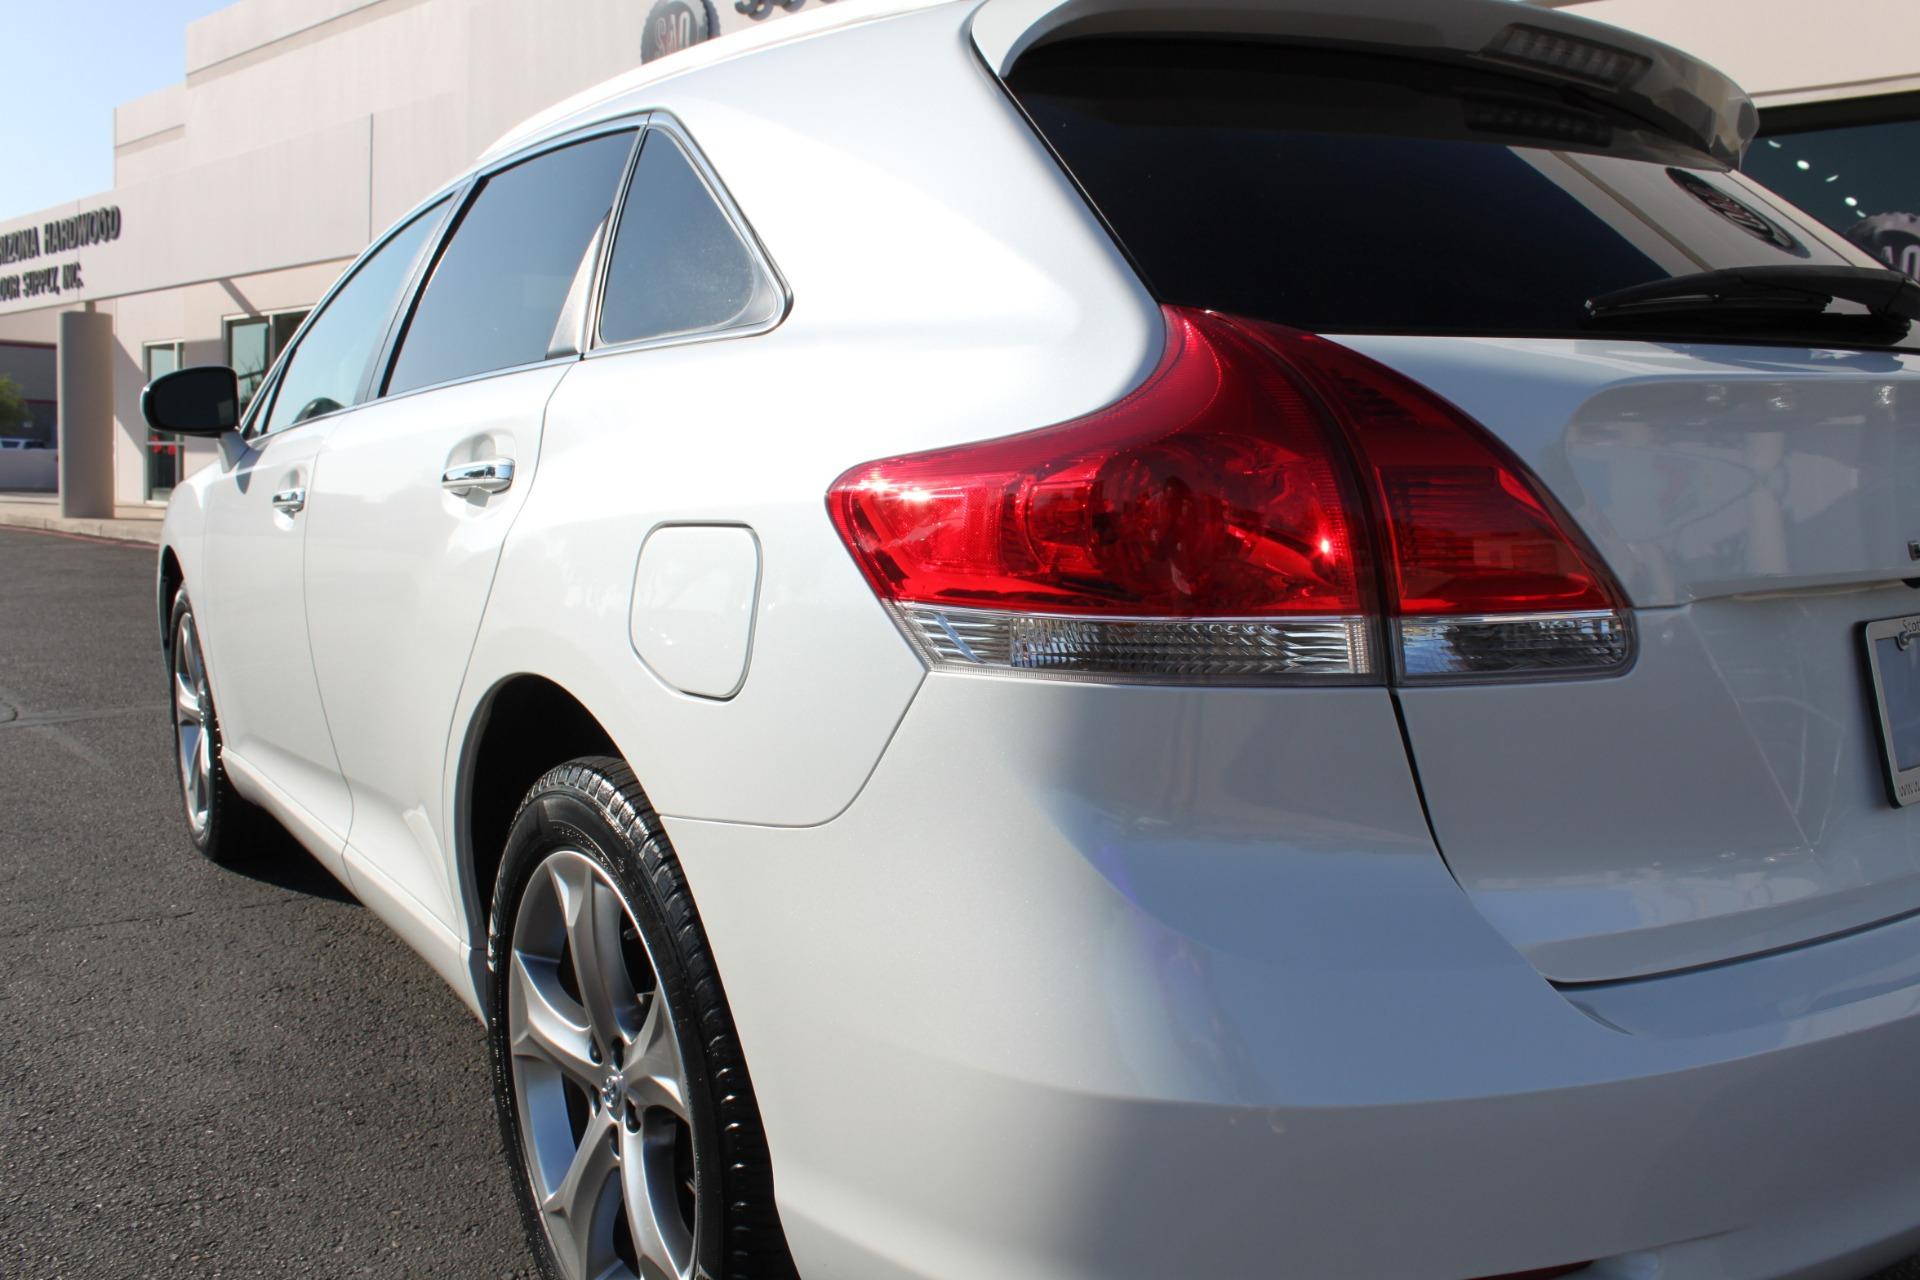 Used-2012-Toyota-Venza-XLE-Alfa-Romeo